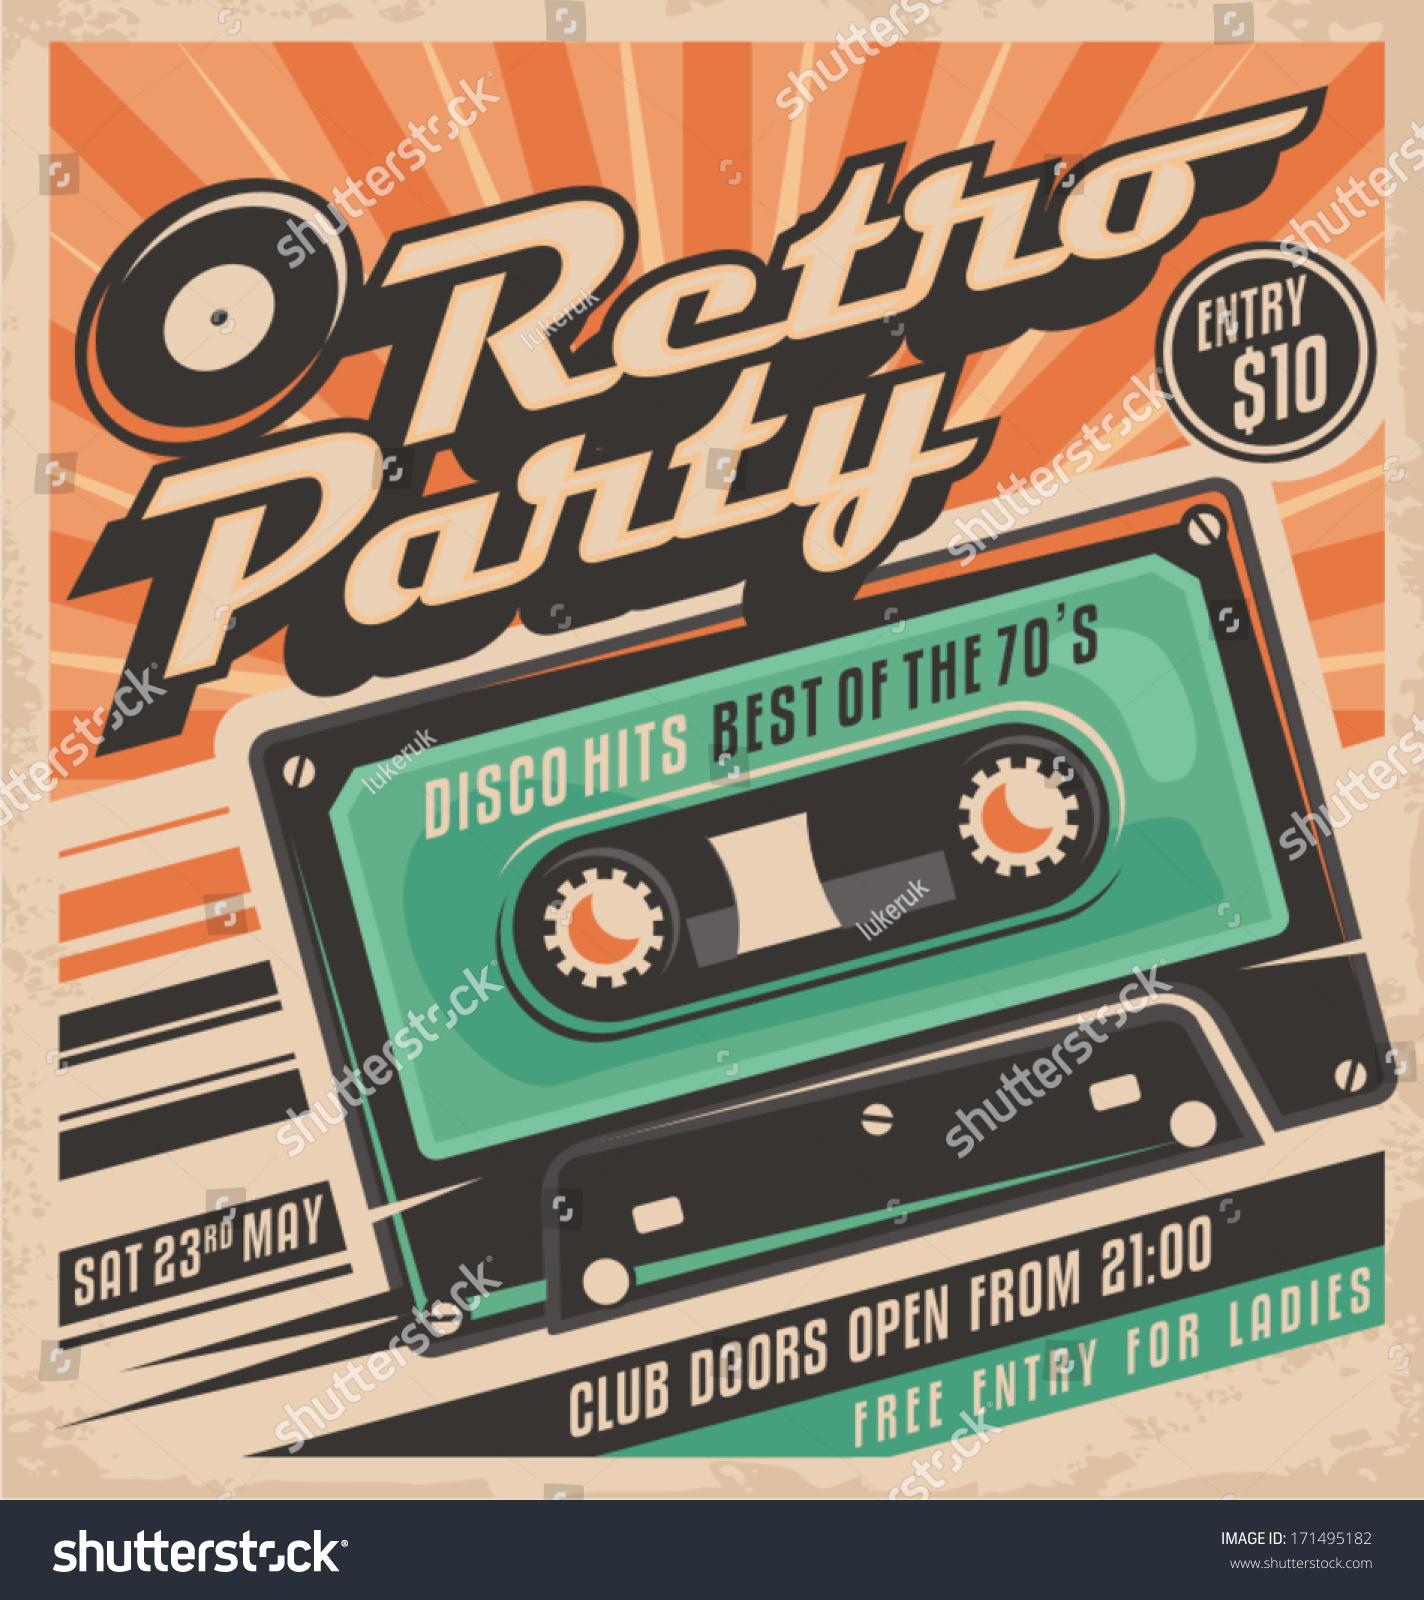 Retro party poster design disco music event at night club vintage invitation template